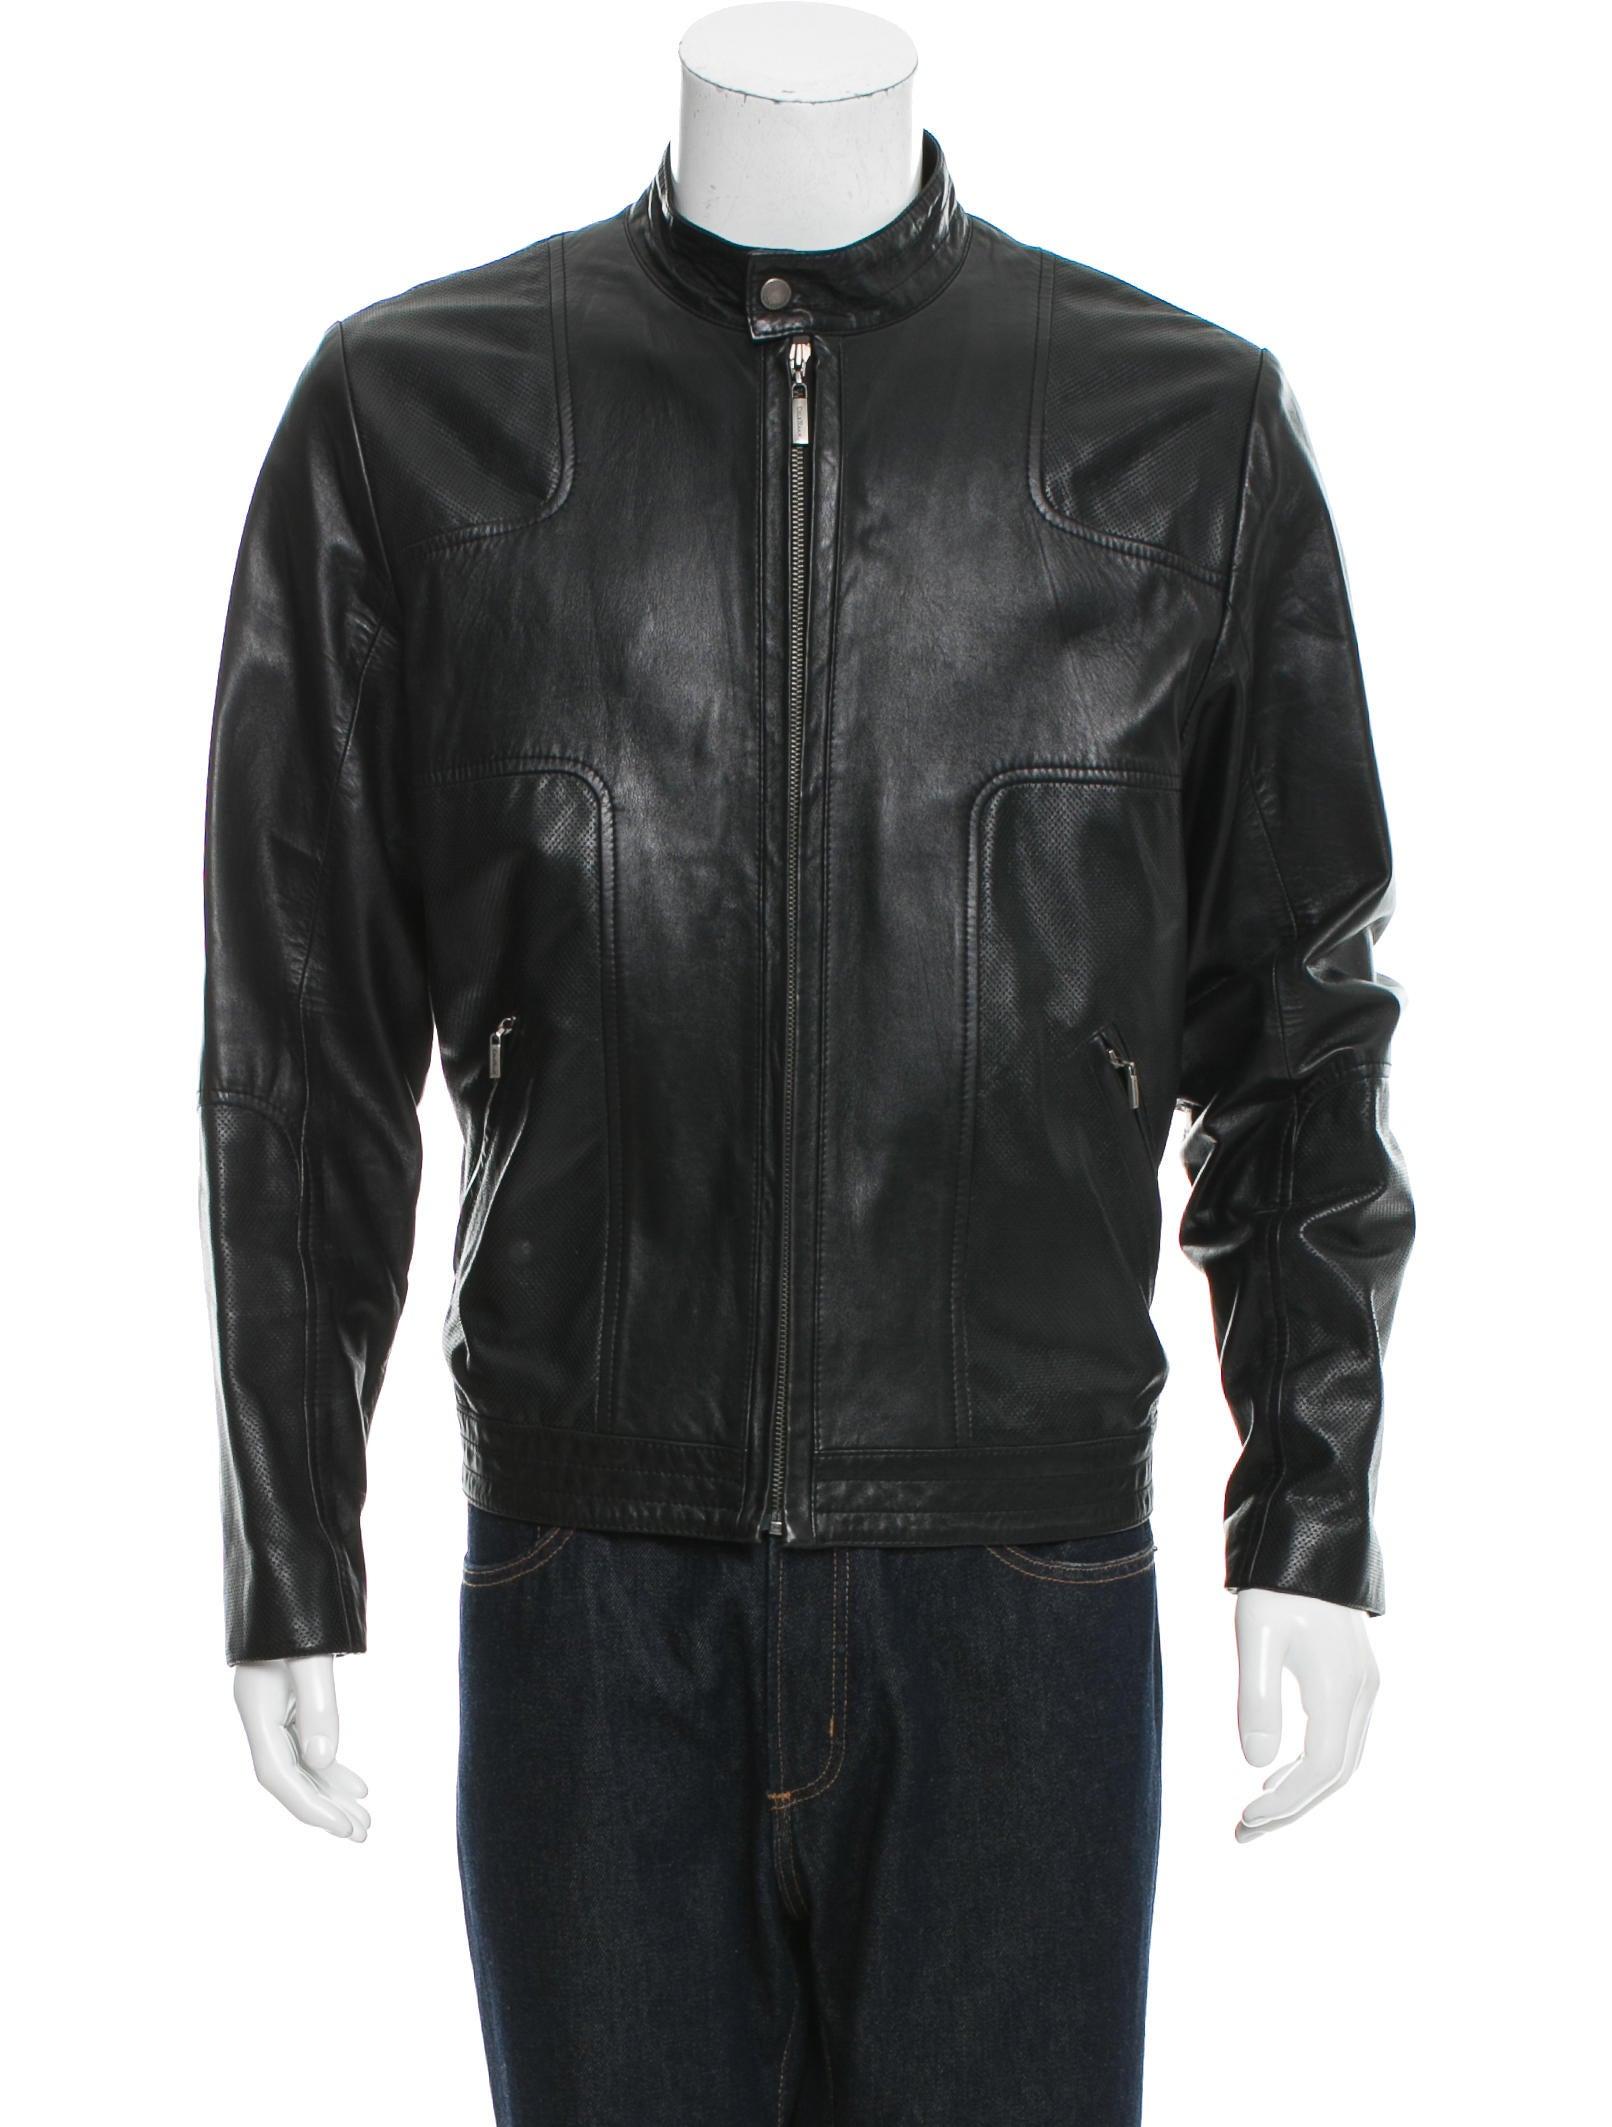 Cole haan leather jacket men